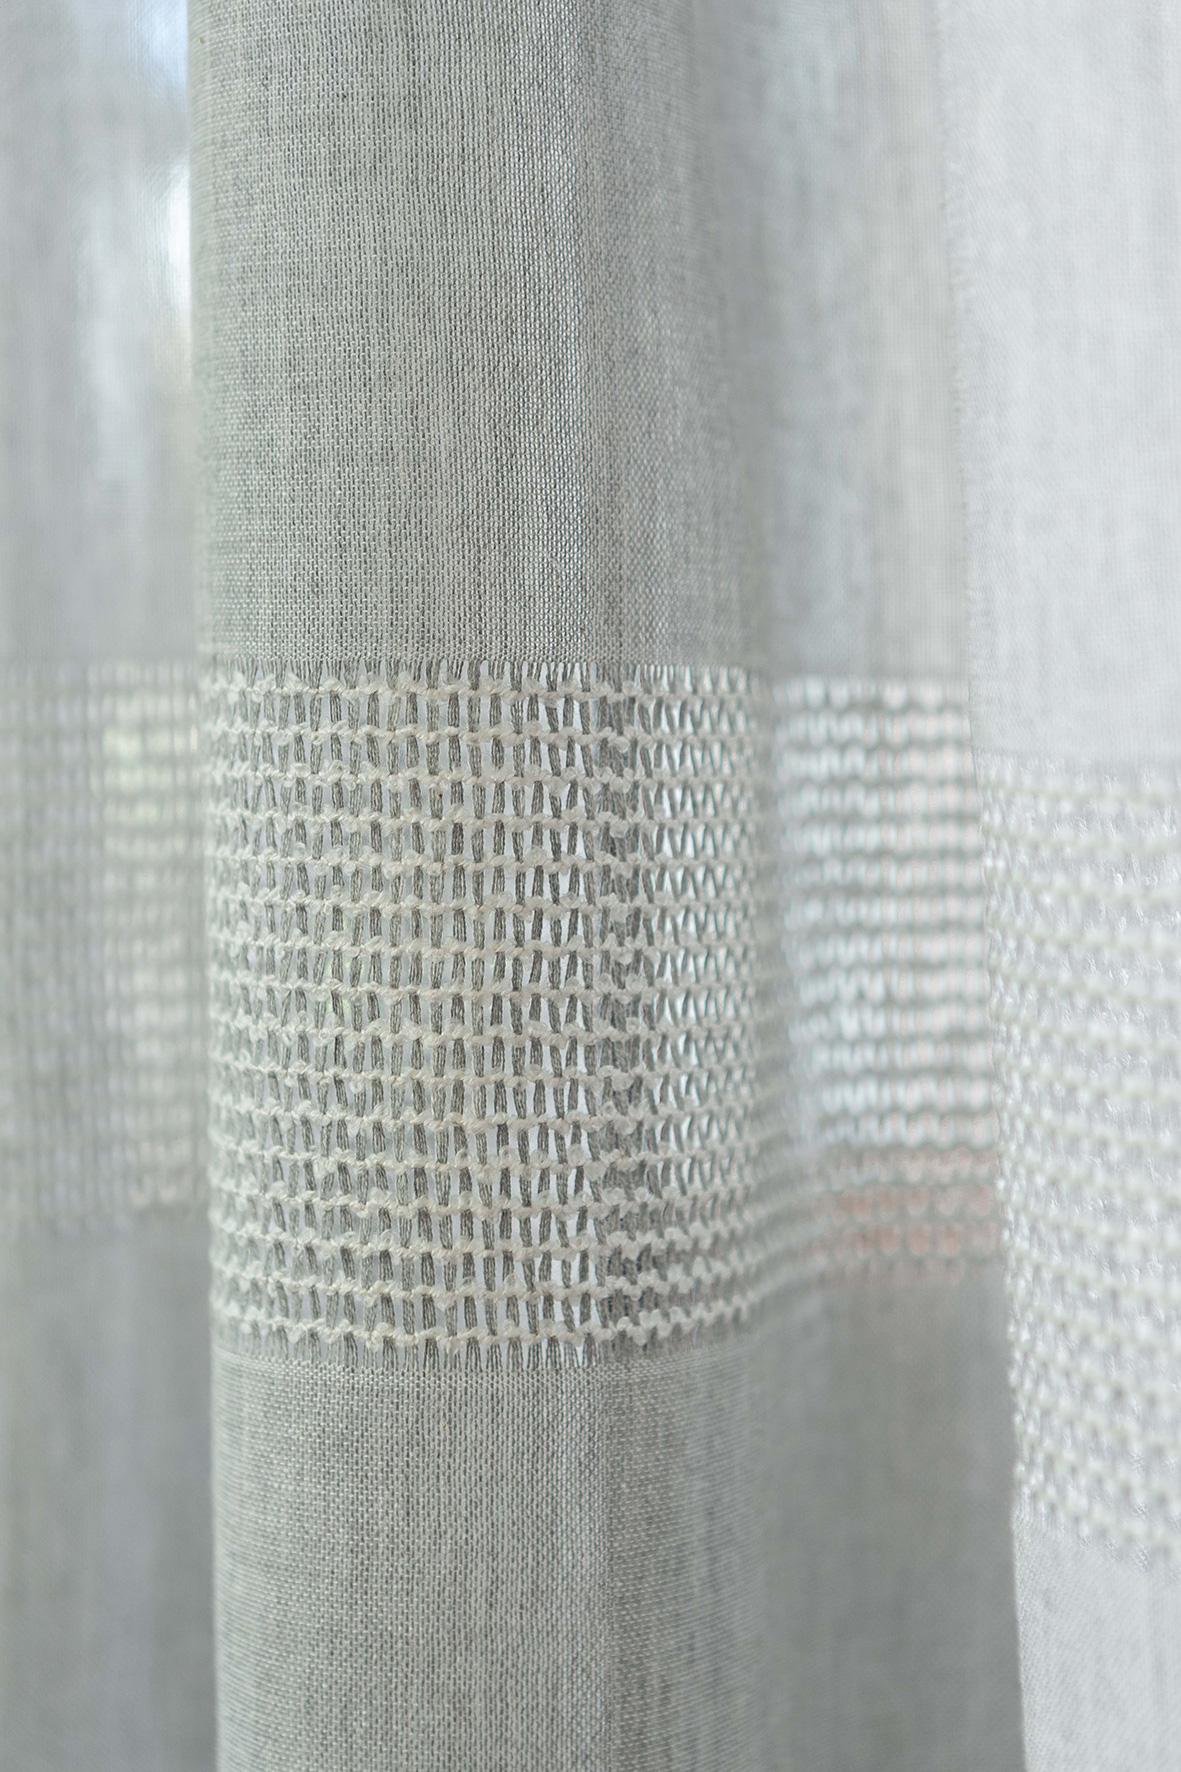 Rasch_Textil_Lagom_Detail.jpg